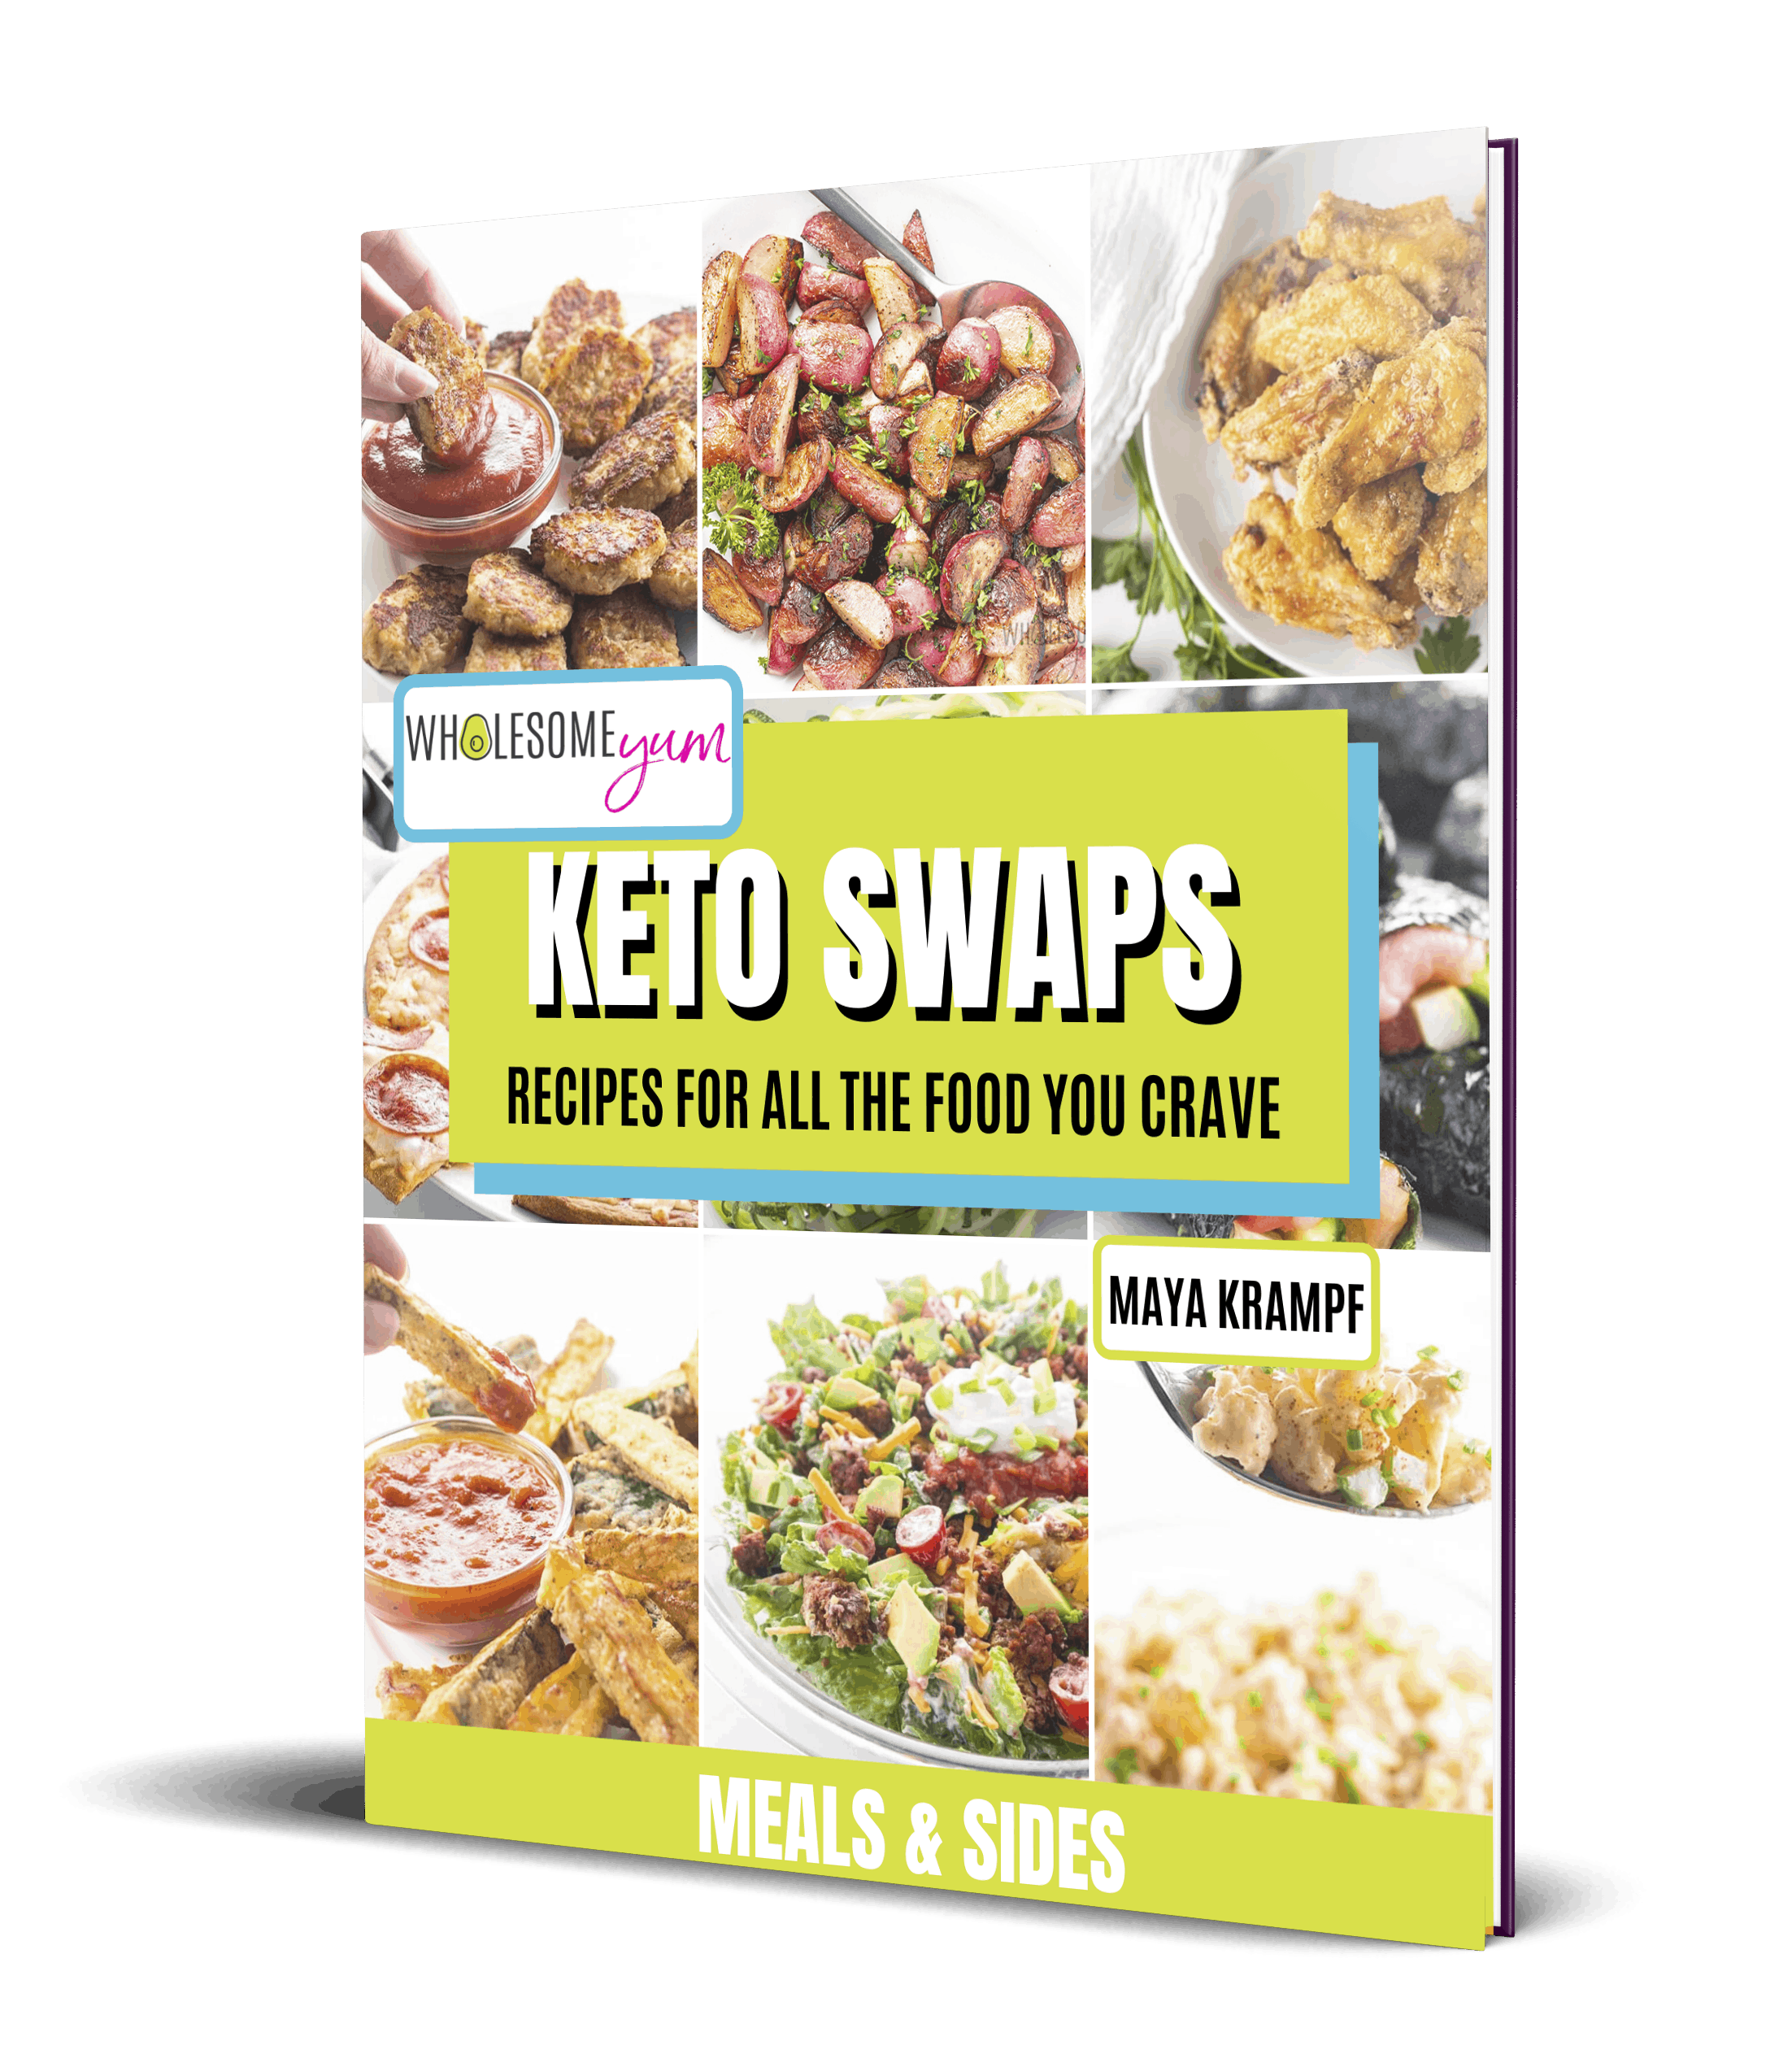 Keto Swaps - Meals & Sides